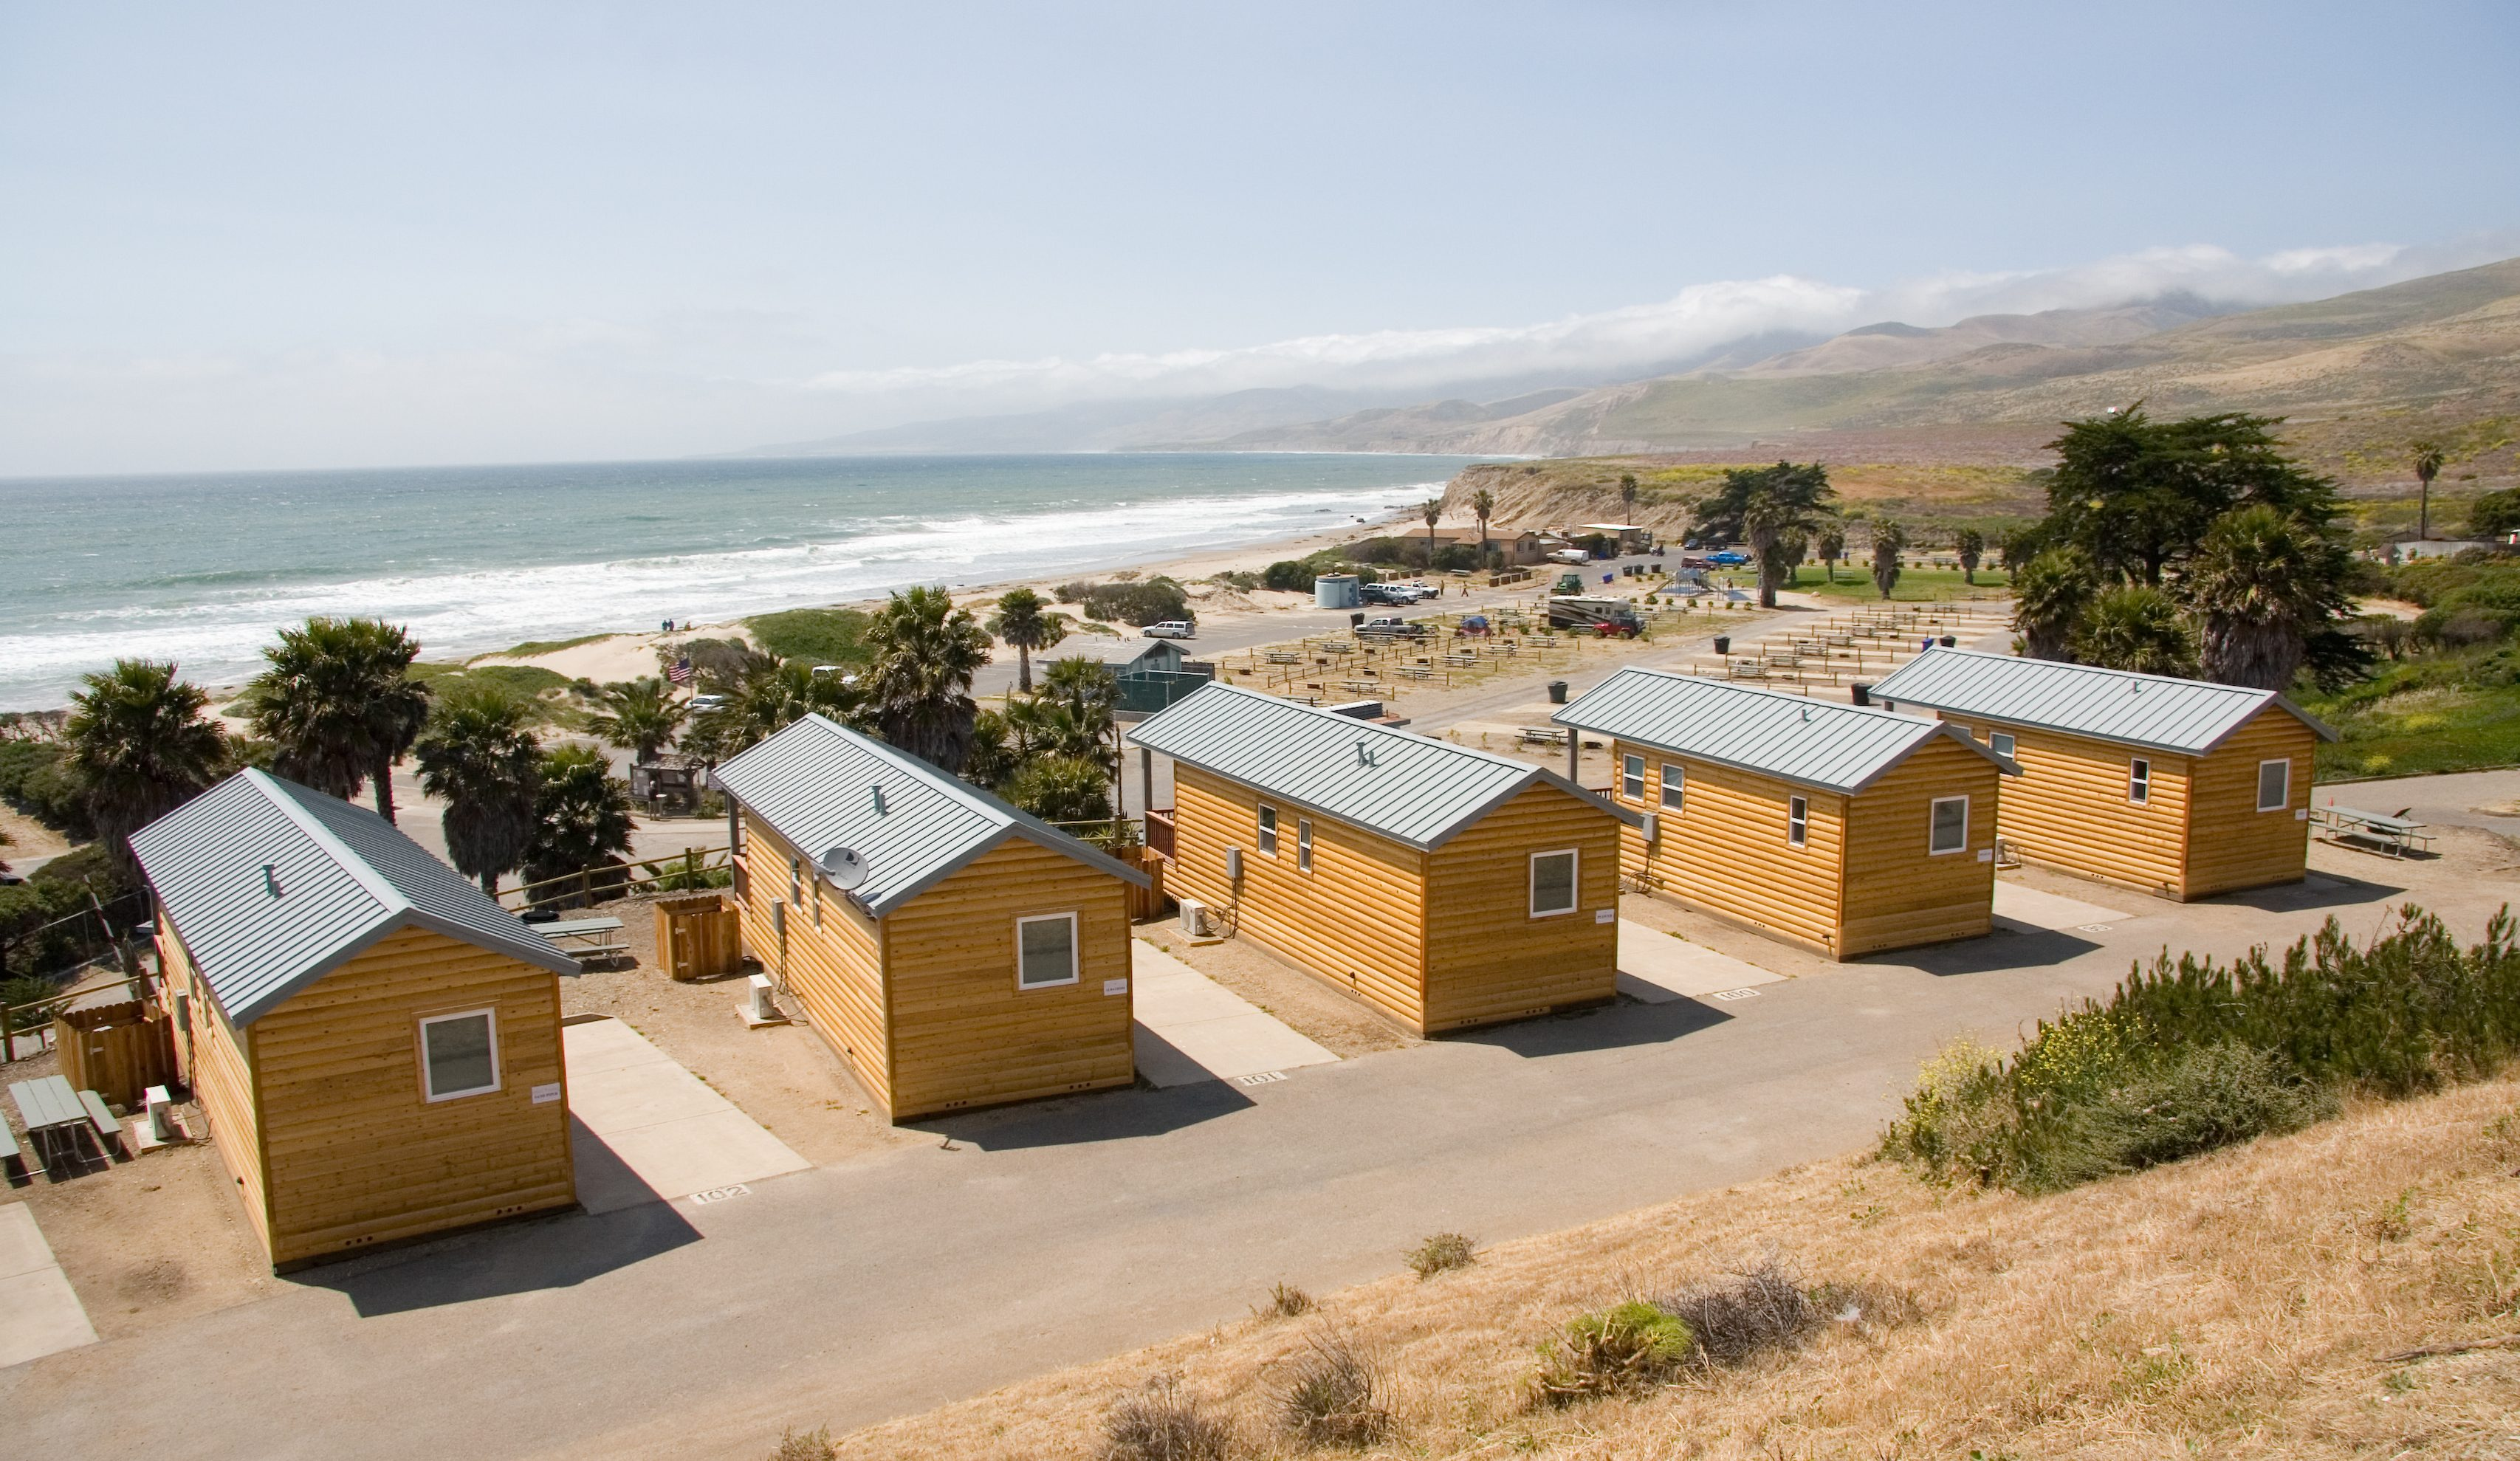 Jalama Beach Camping Reservations